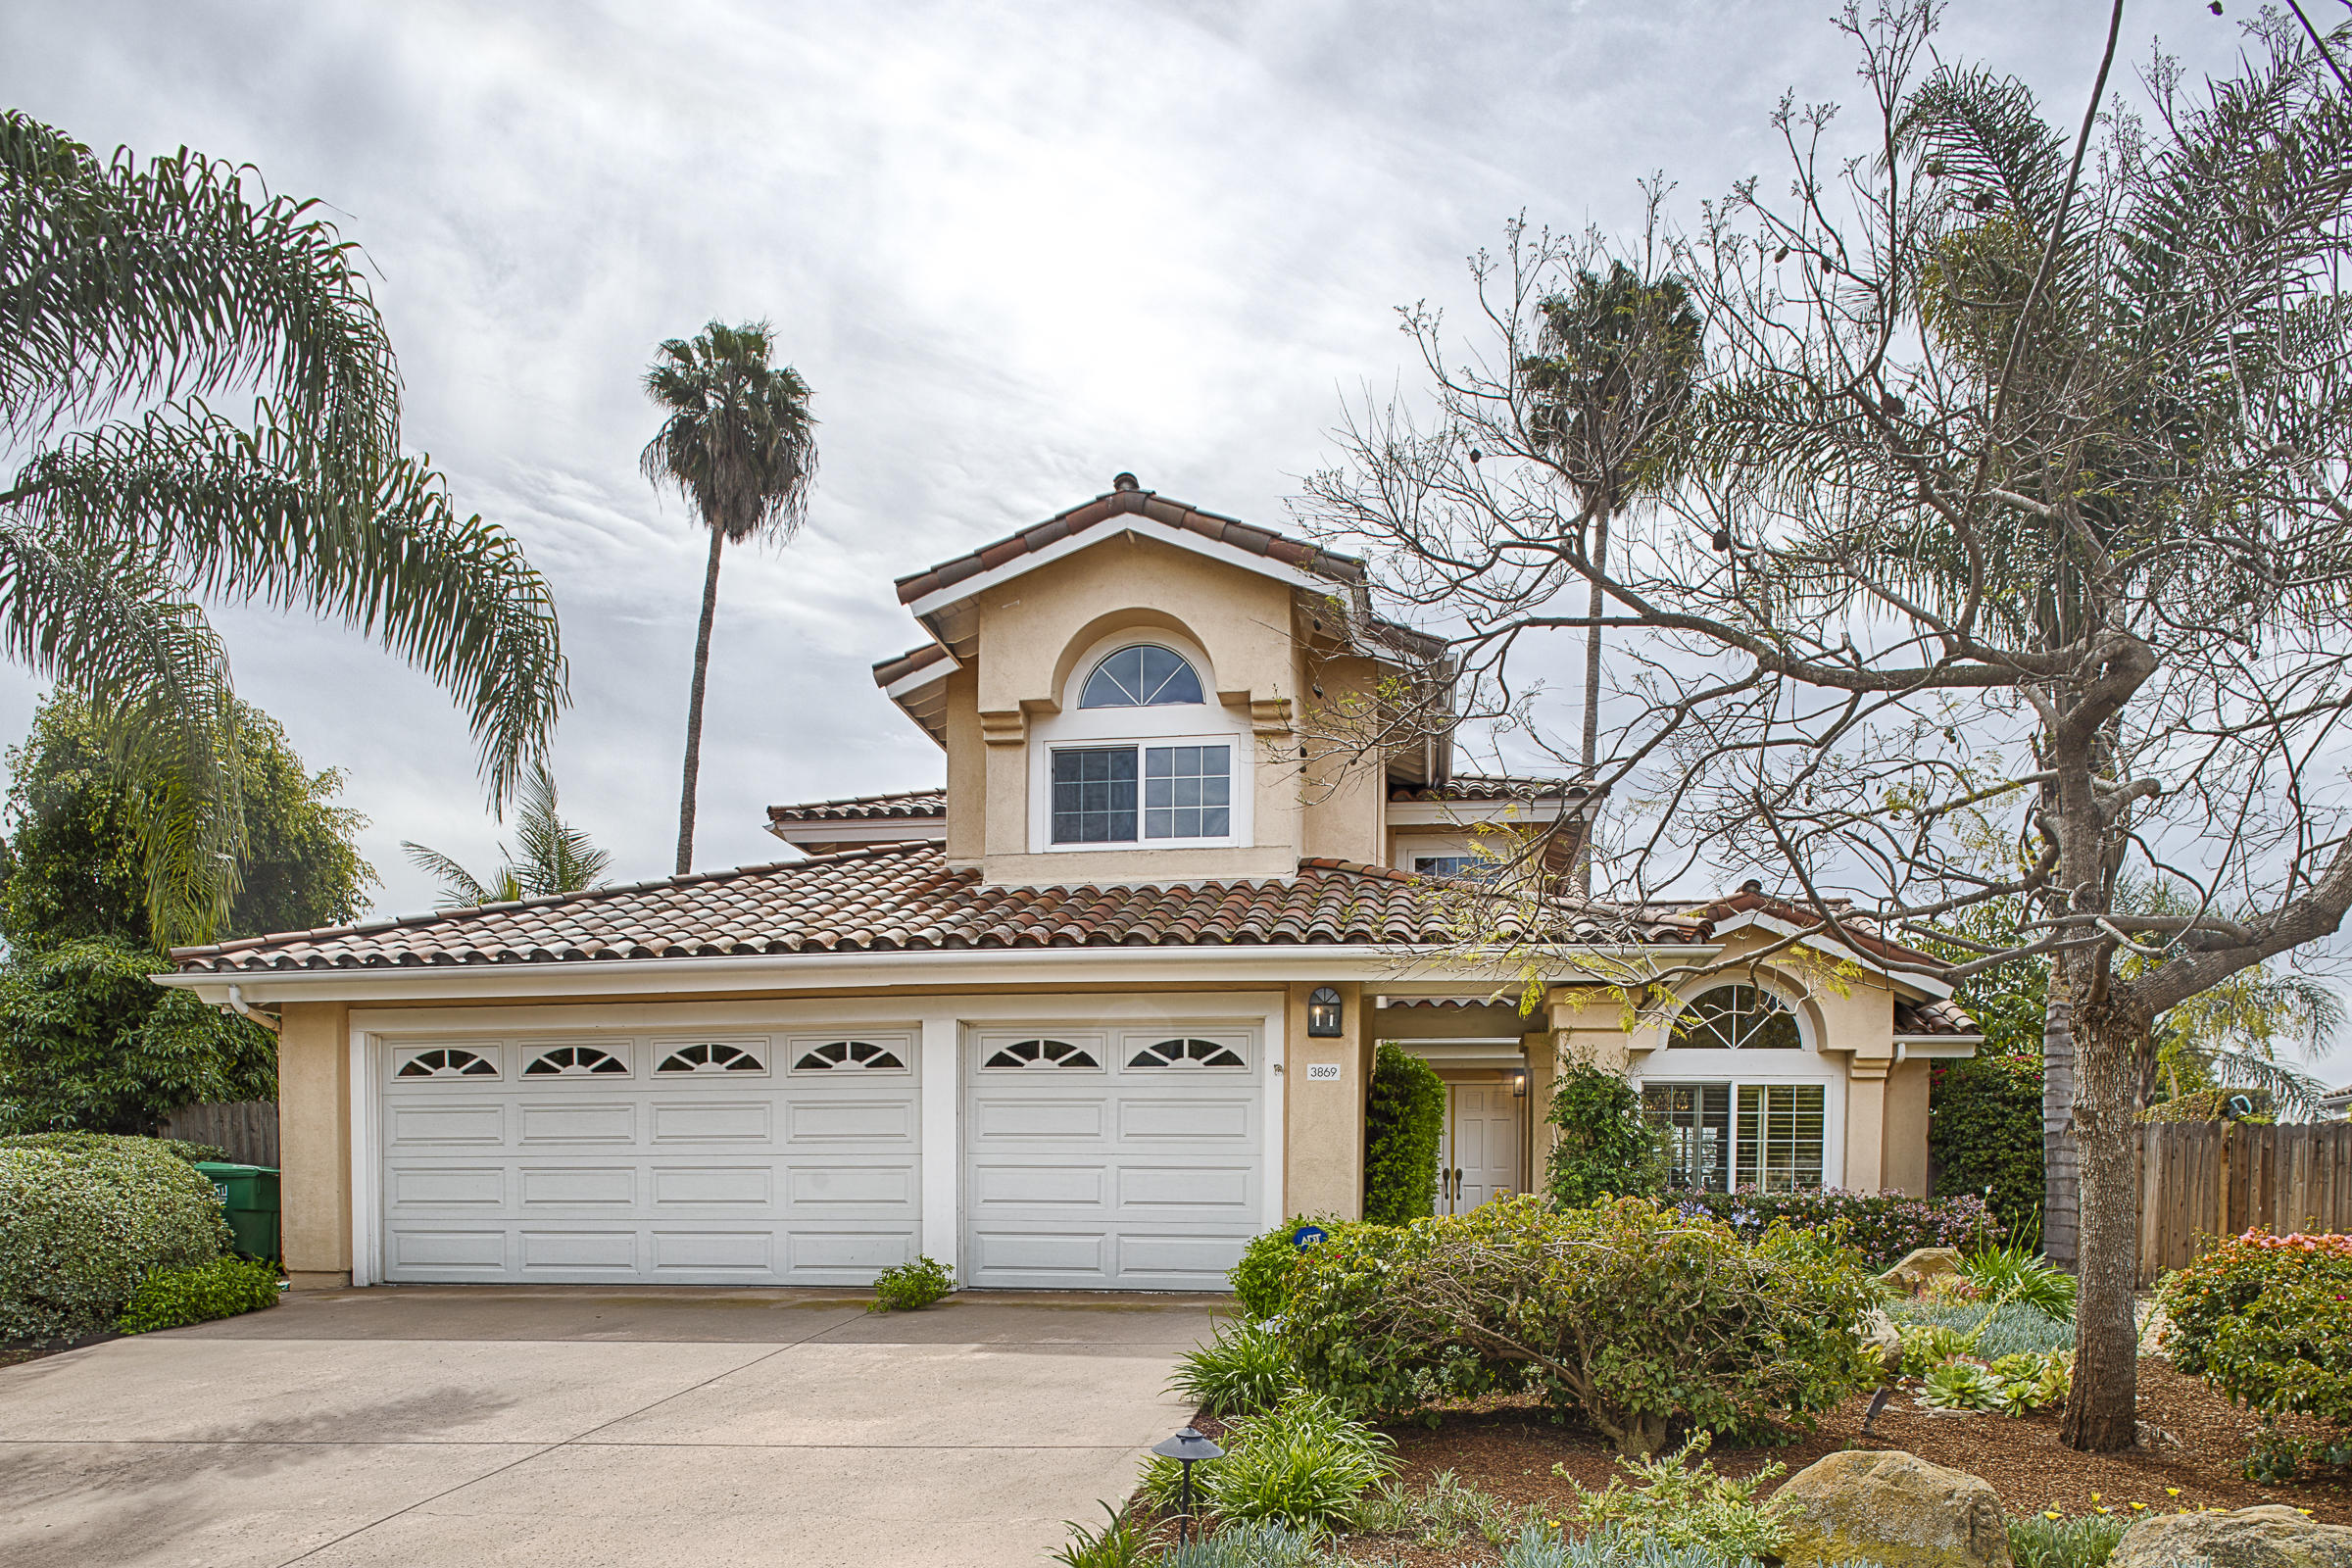 Property photo for 3869 Via Las Brisas Santa Barbara, California 93110 - 17-1255